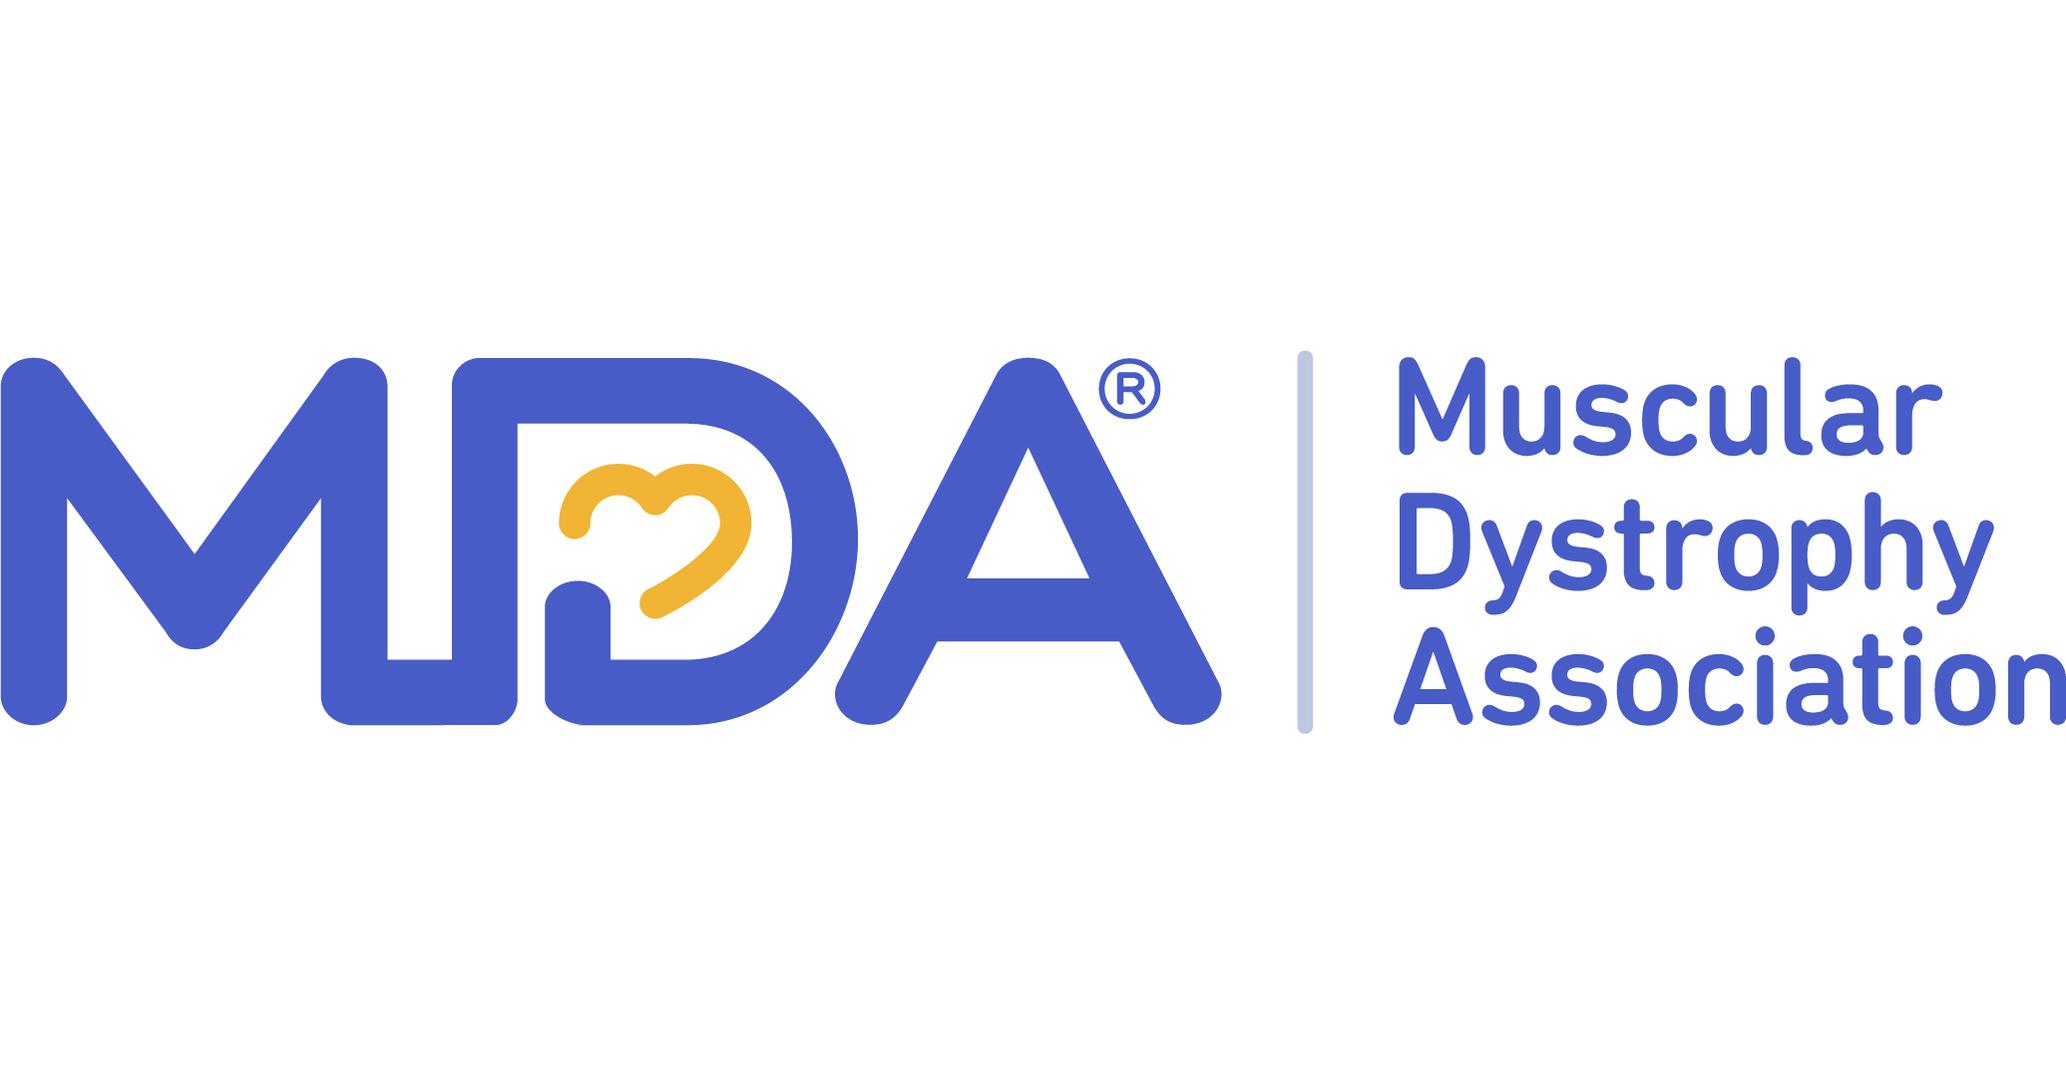 Muscular Dystrophy Association.jpg